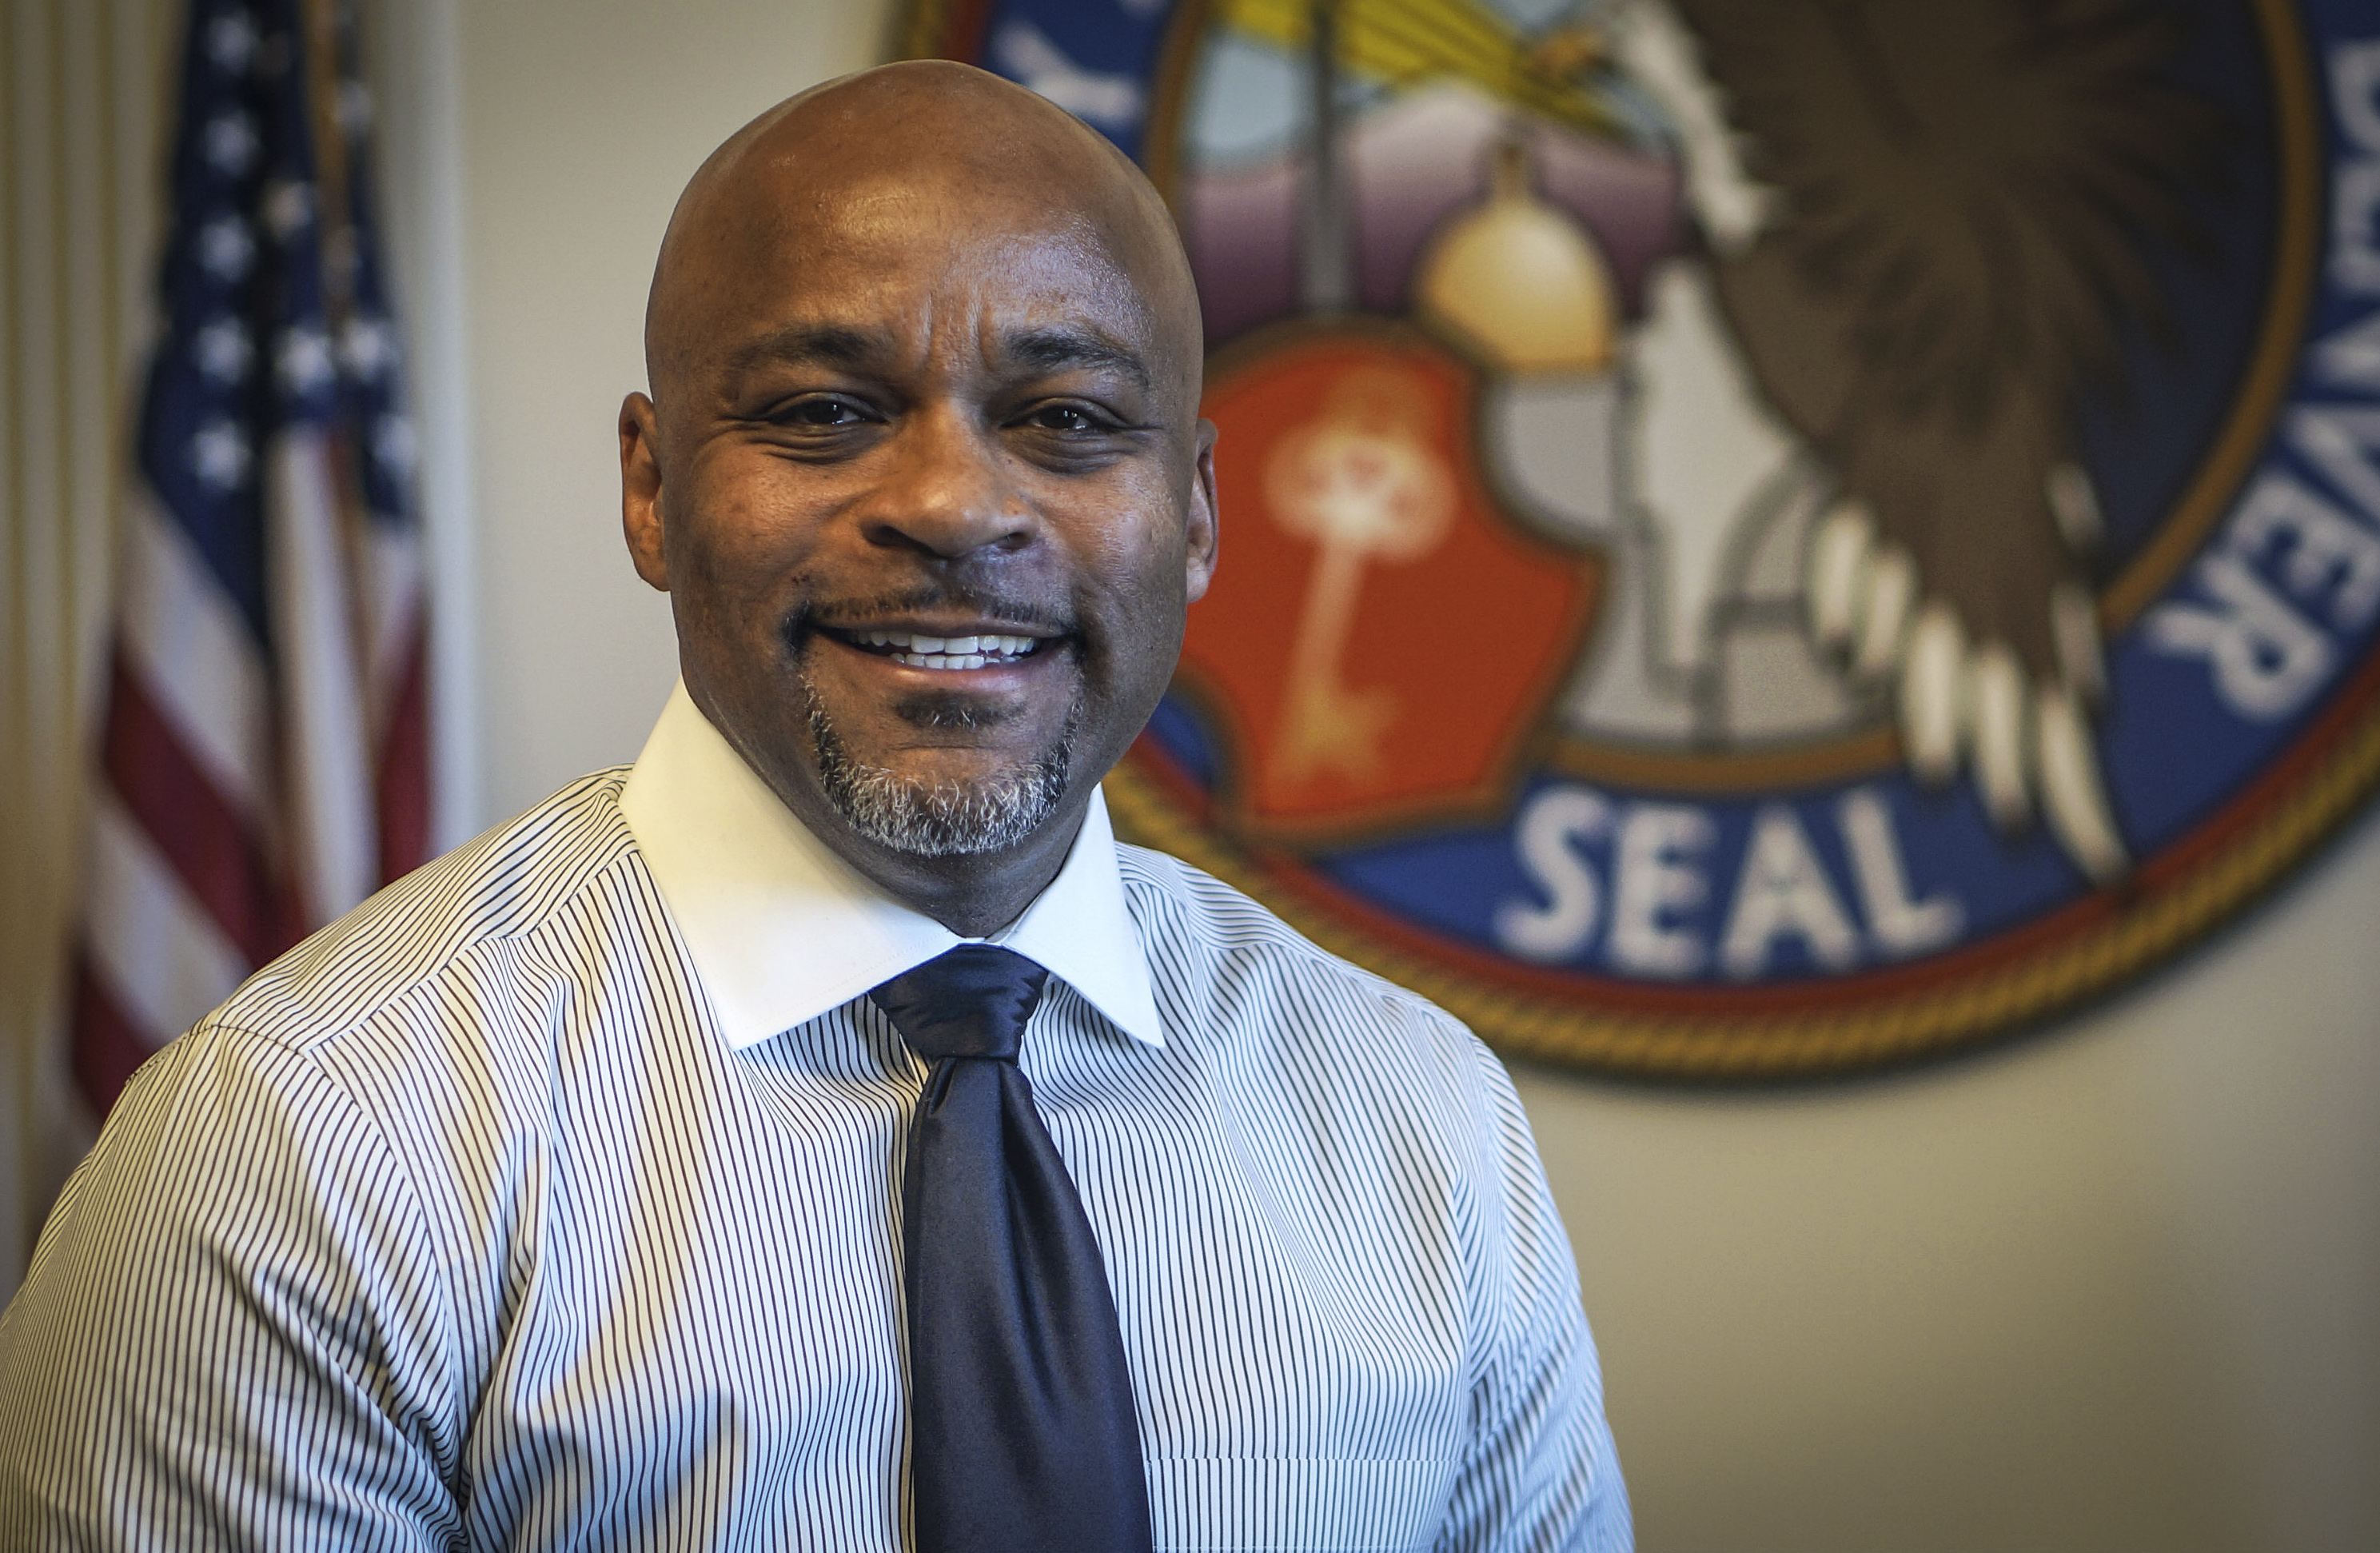 <p>Denver Mayor Michael Hancock at his office on Nov. 8, 2017.</p>